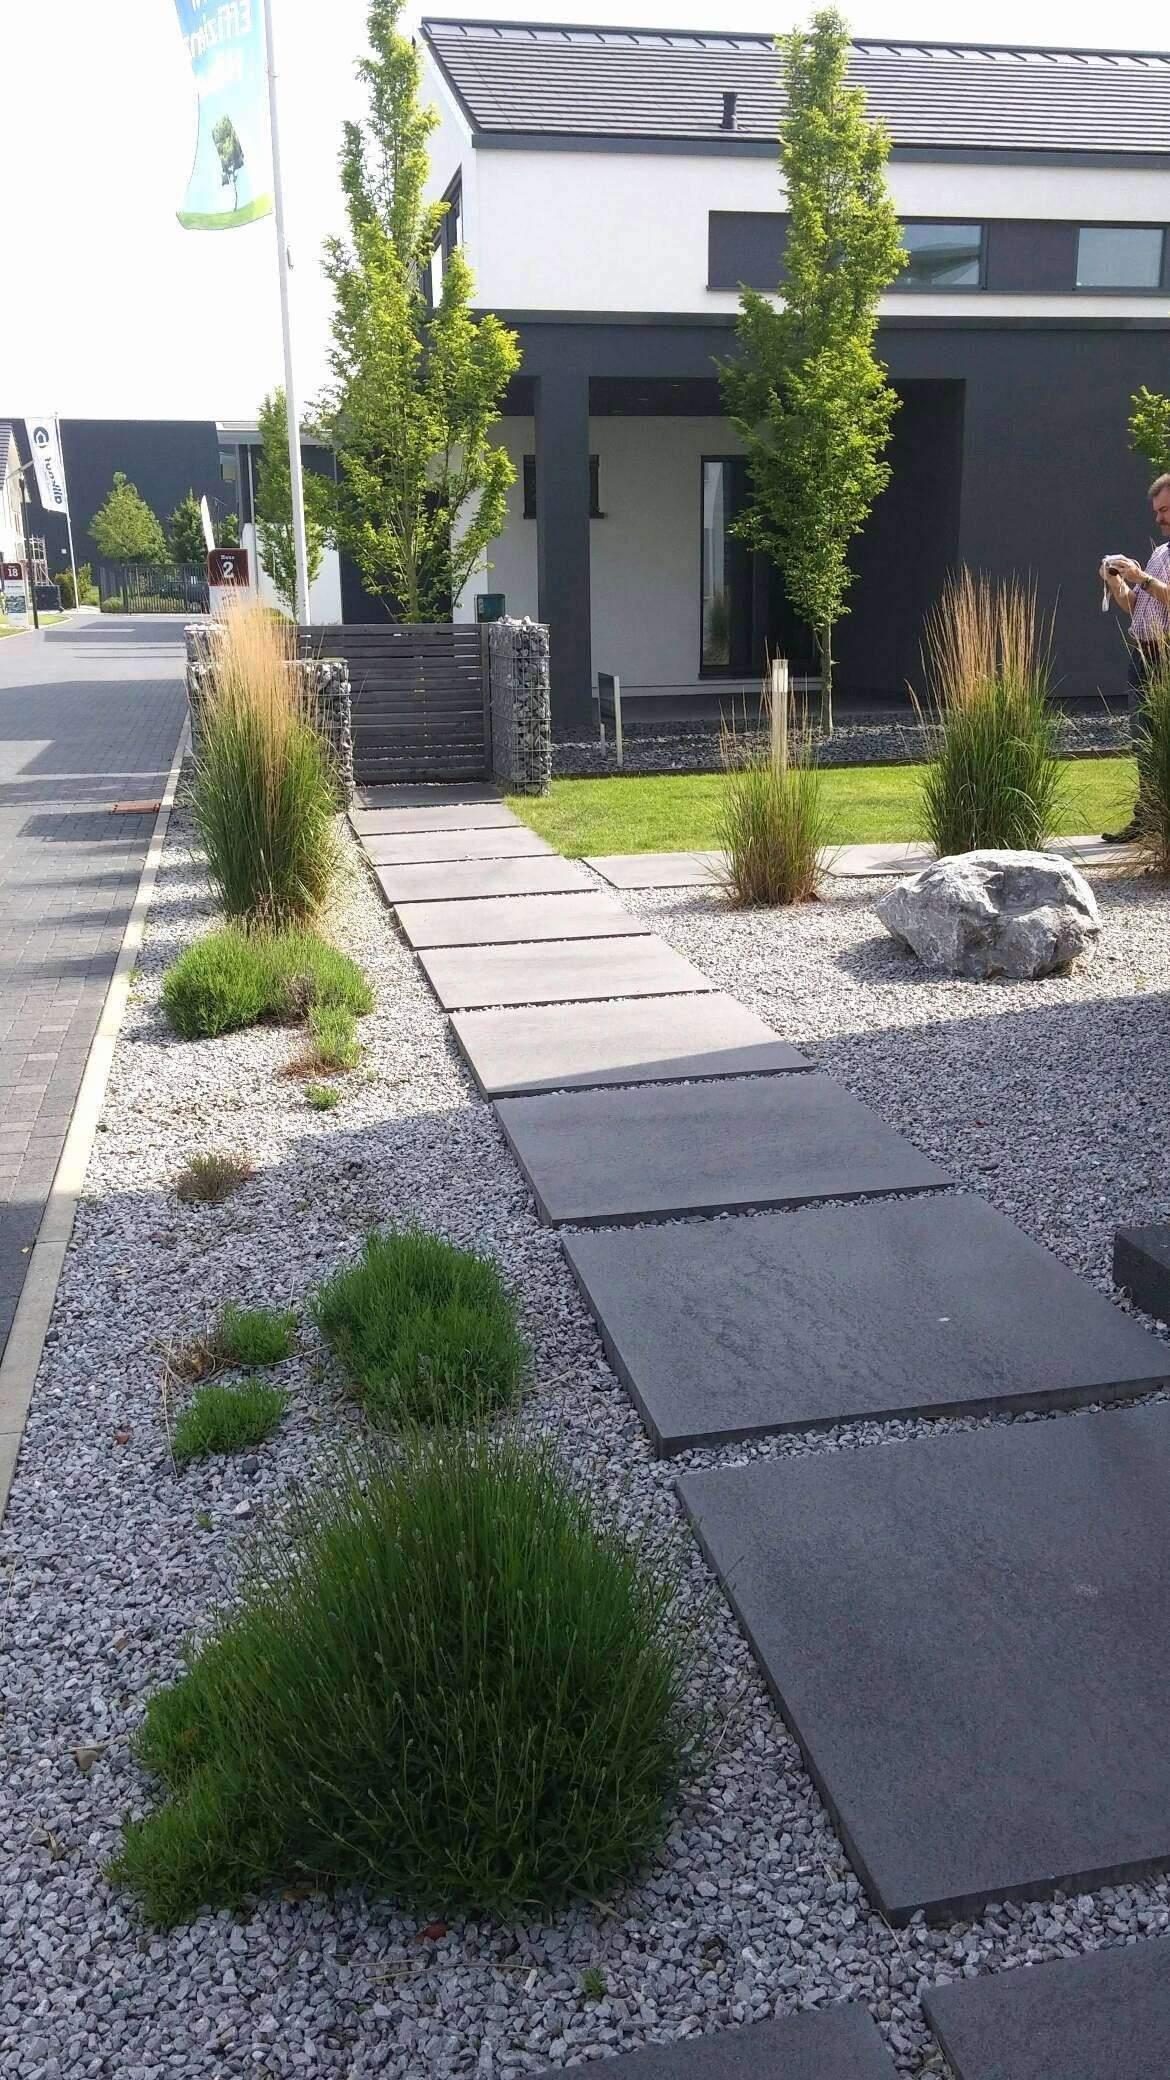 Garten Fliesen Das Beste Von Garten Ideas Garten Anlegen Lovely Aussenleuchten Garten 0d